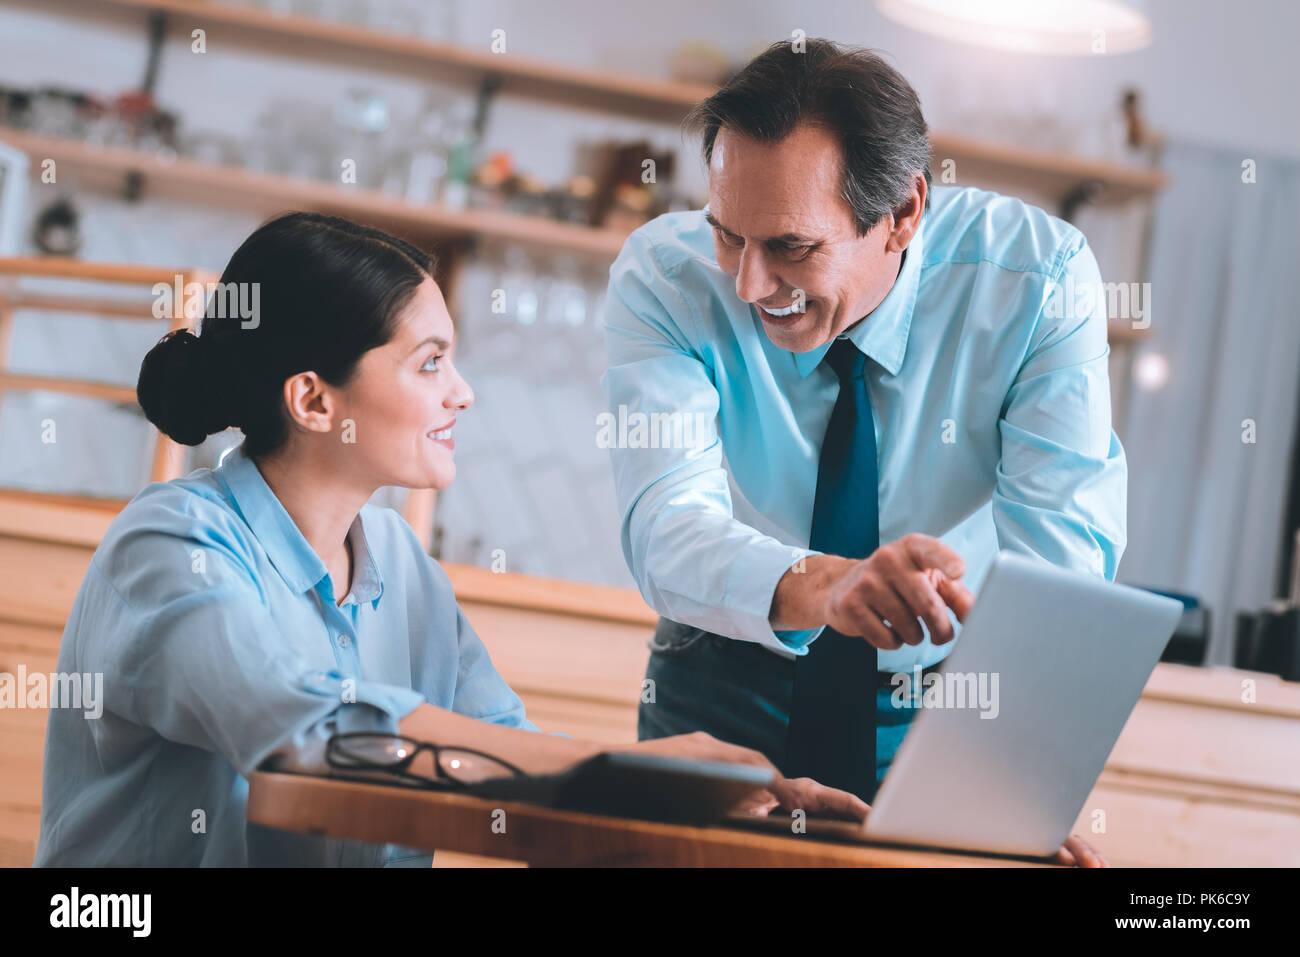 Schöne brünette Frau an ihrem Arbeitsplatz sitzen Stockbild